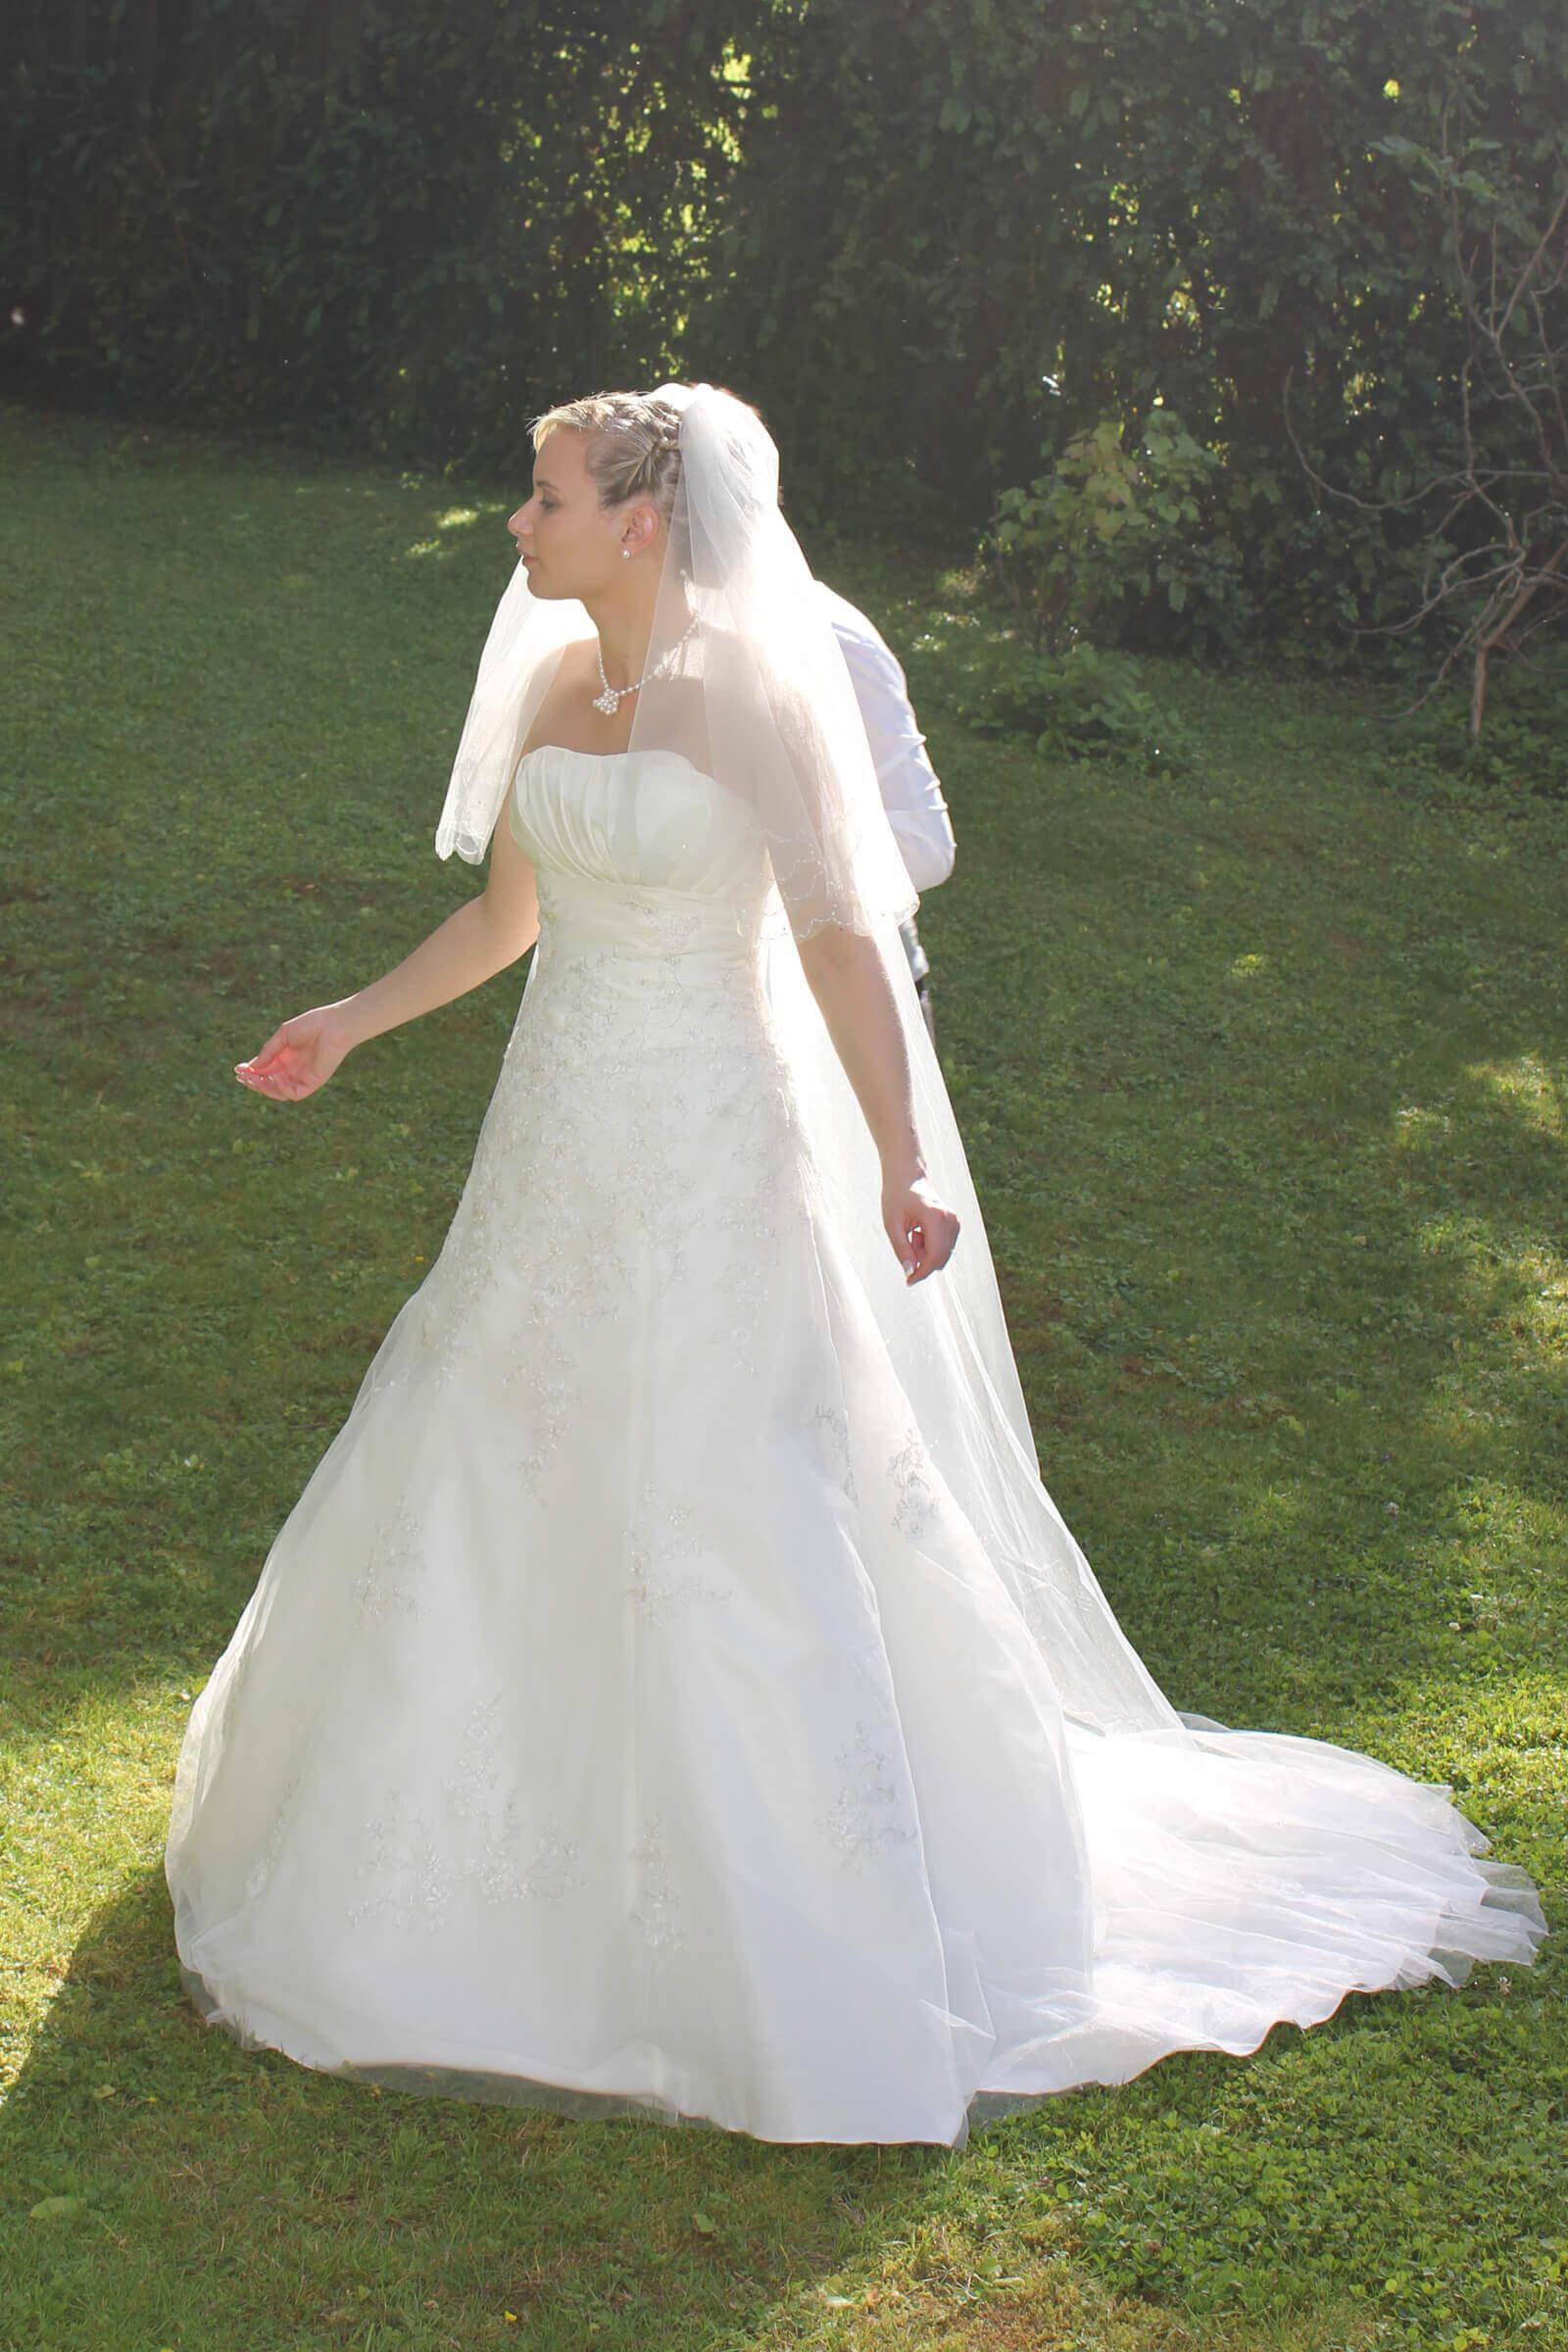 Photographe epernay Photo mariage Tristan Meunier-12.jpg